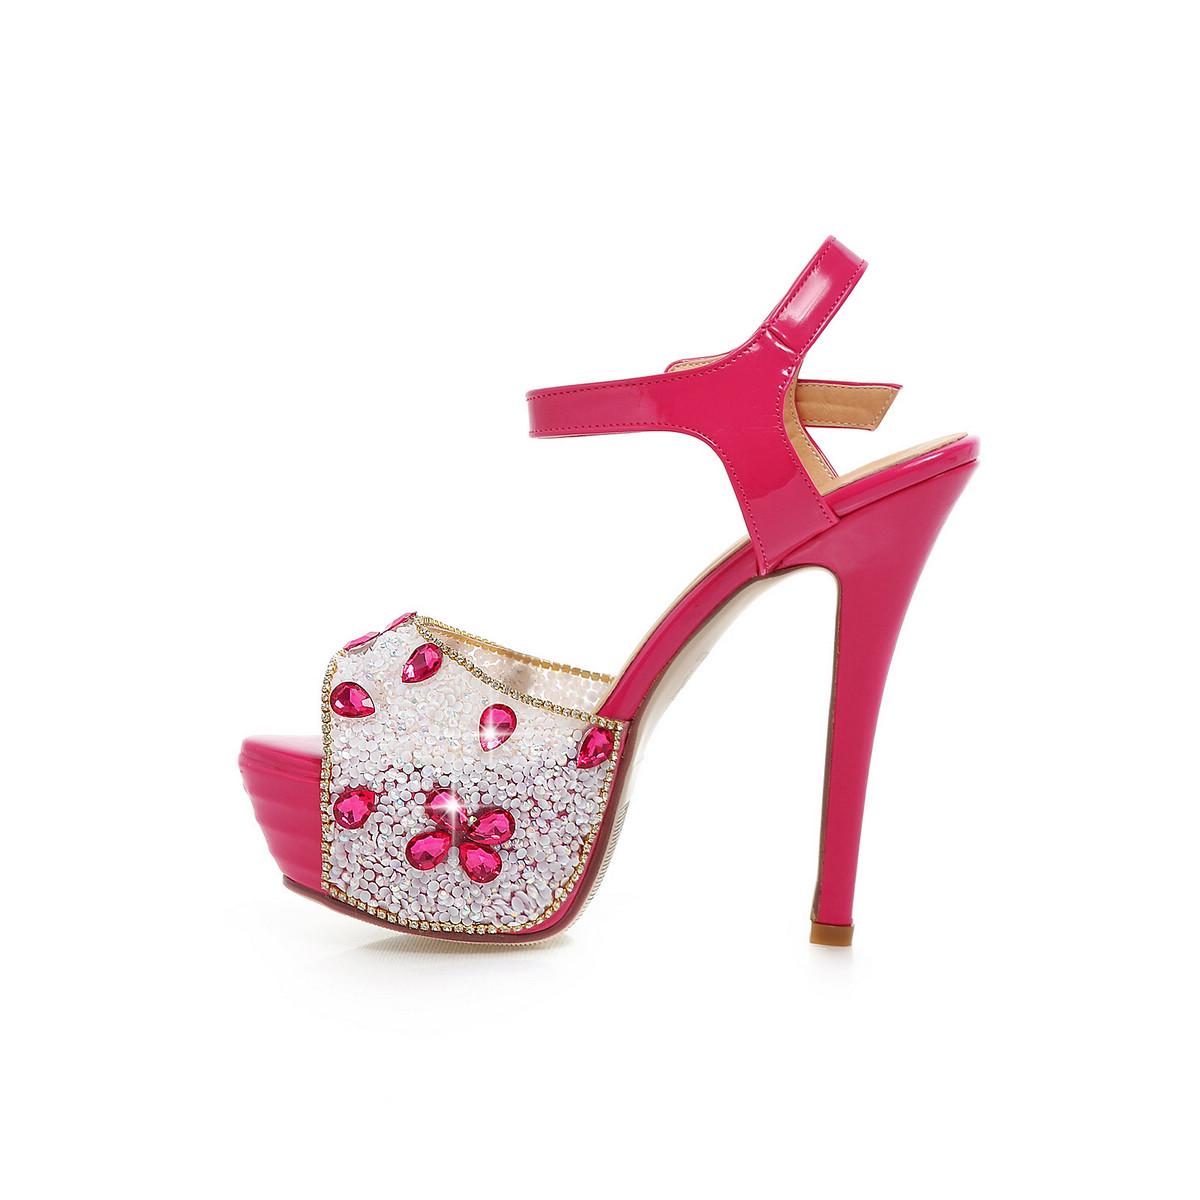 Us 43 2018 Sumer High Heels 14cm Stilettos P Toe Platform Lace Up Sandals Crystal Wedding Shoes Www Ardenfurtado